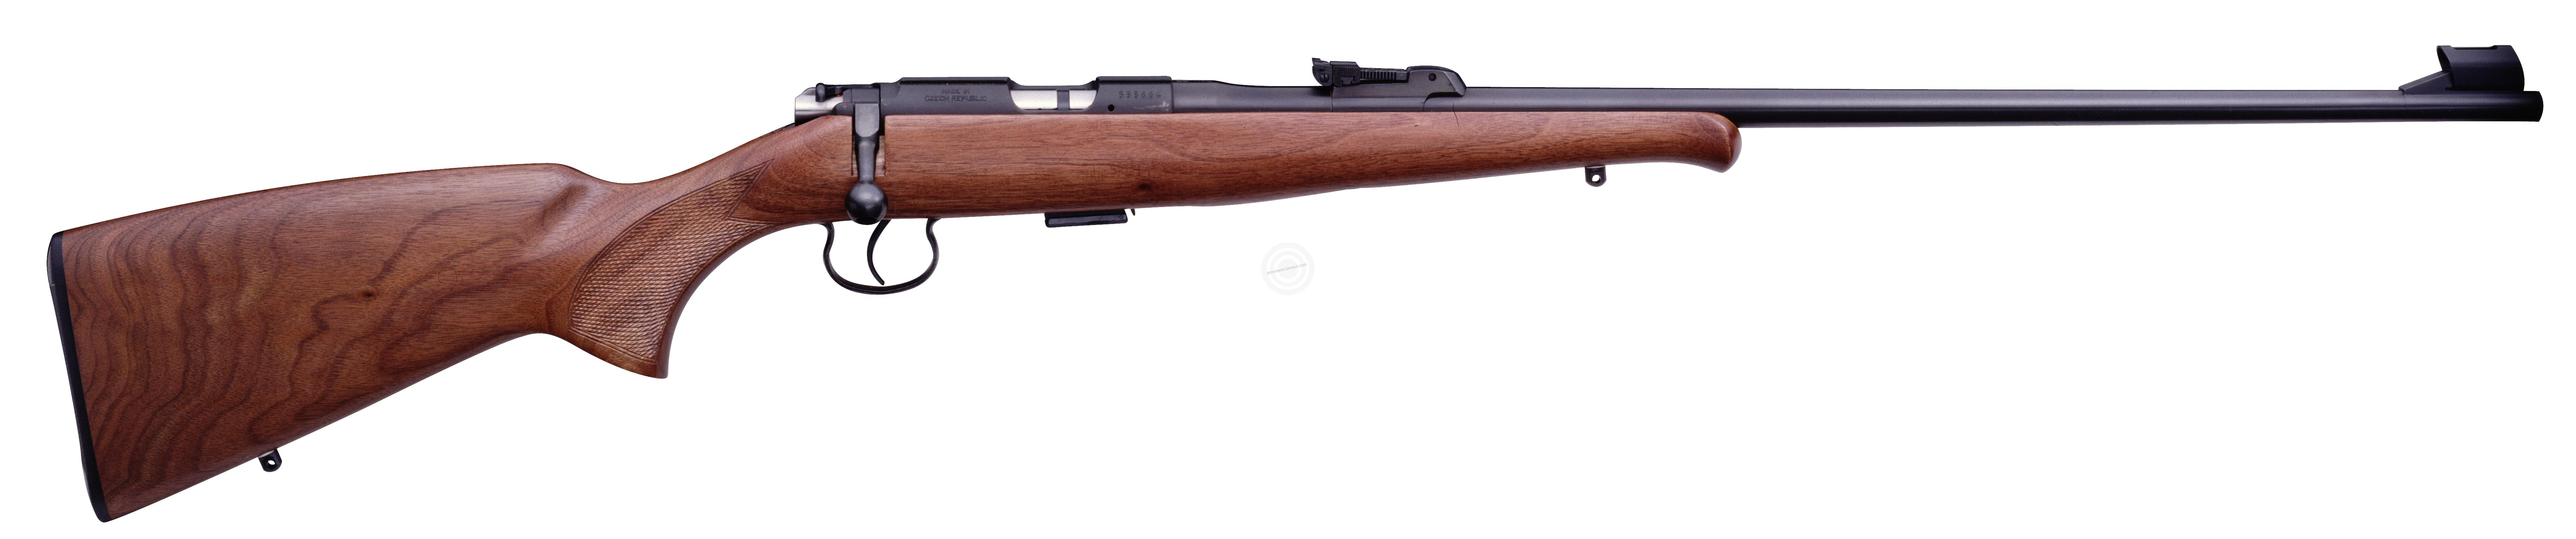 Carabine 22LR CZ 452 Luxe